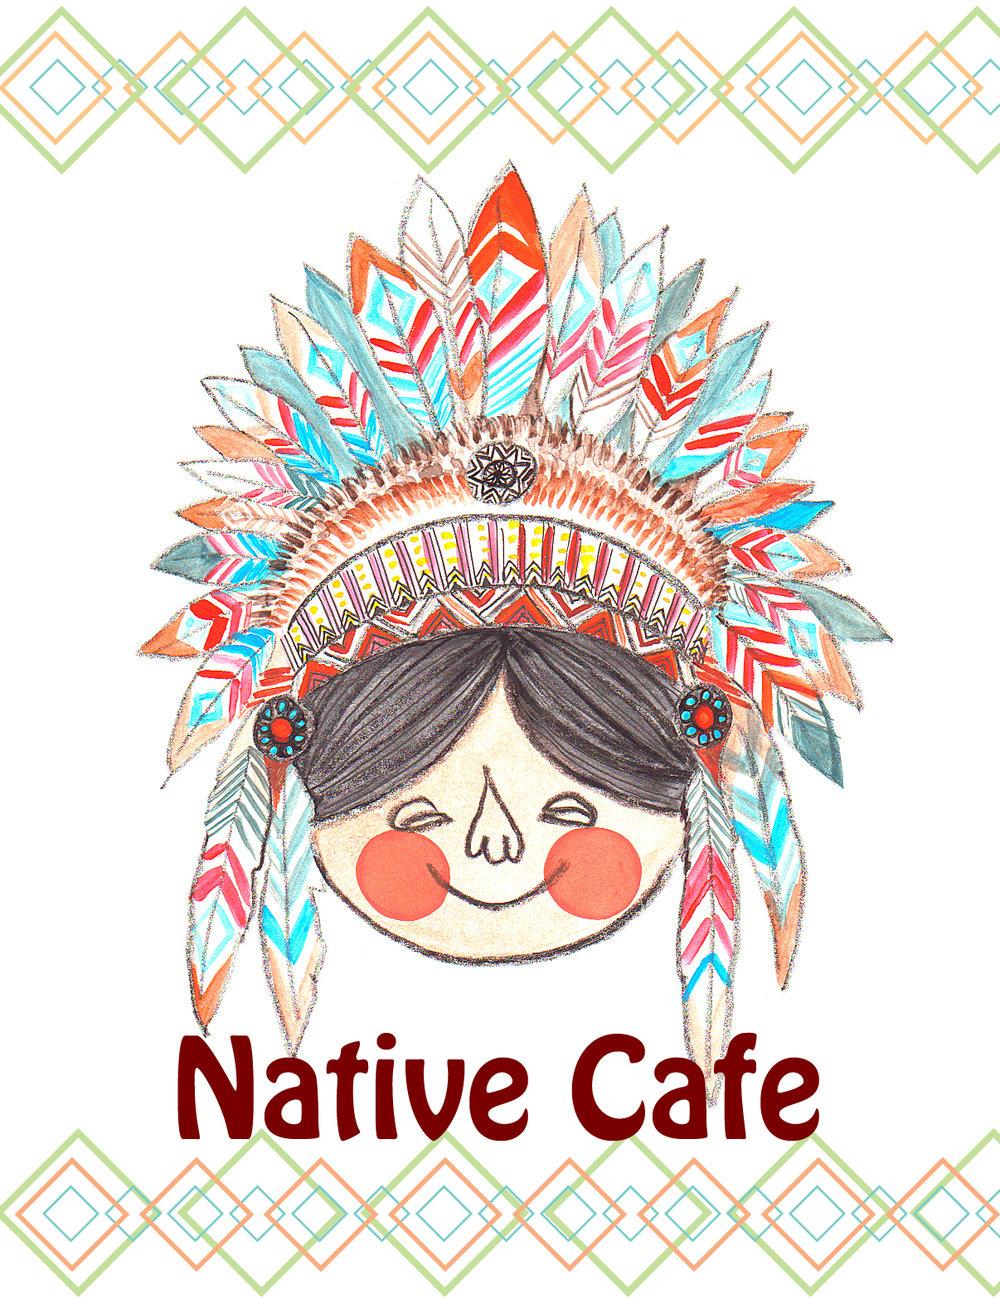 nativecafe.jpg